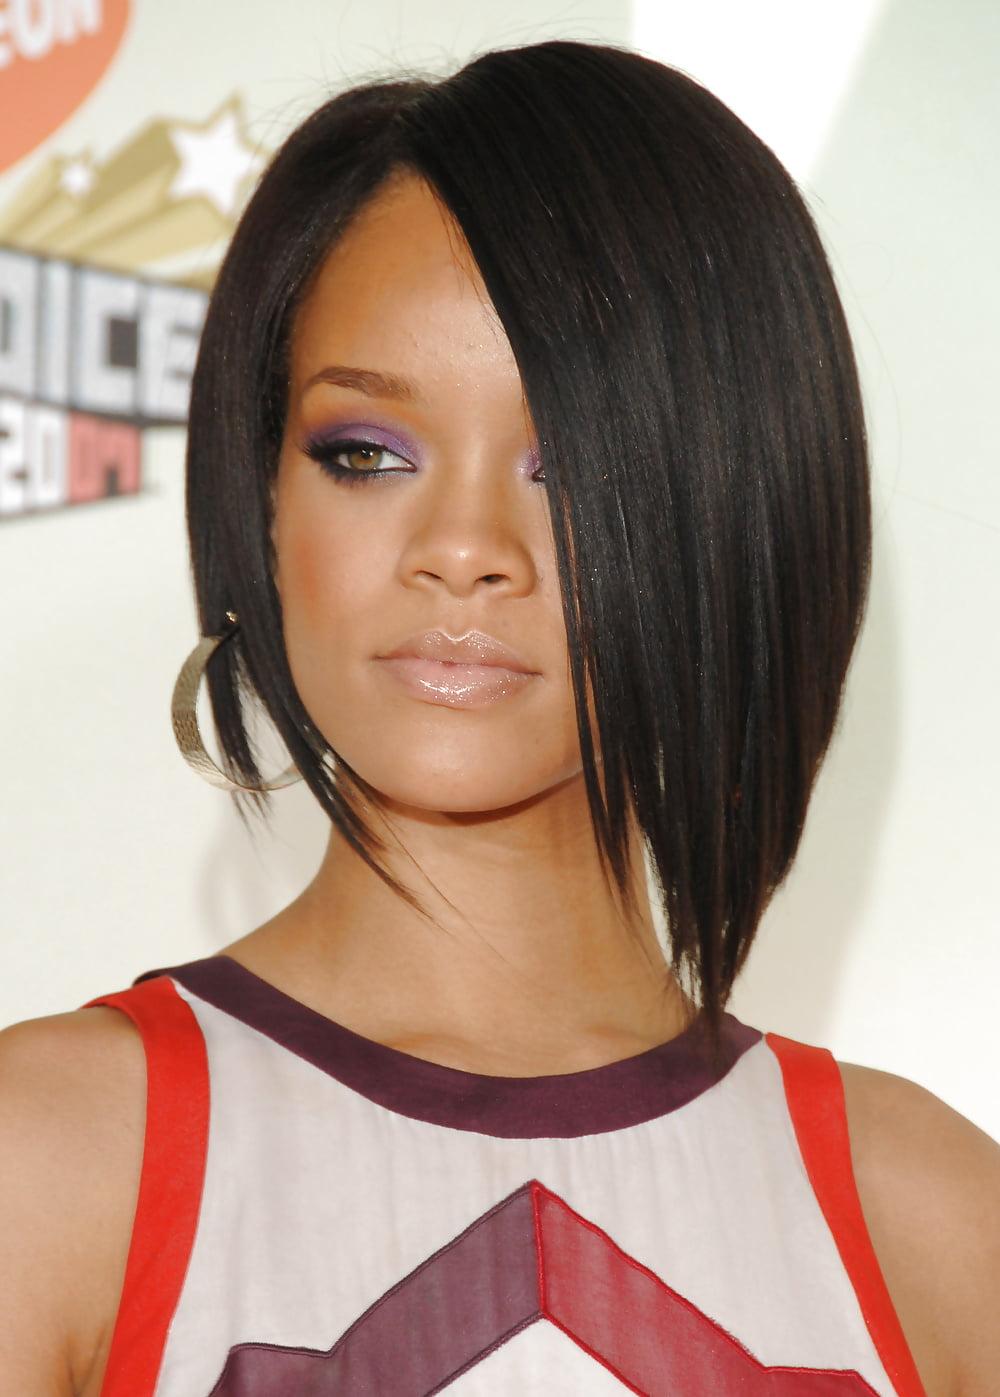 Mohawk black girl hairstyles-2699